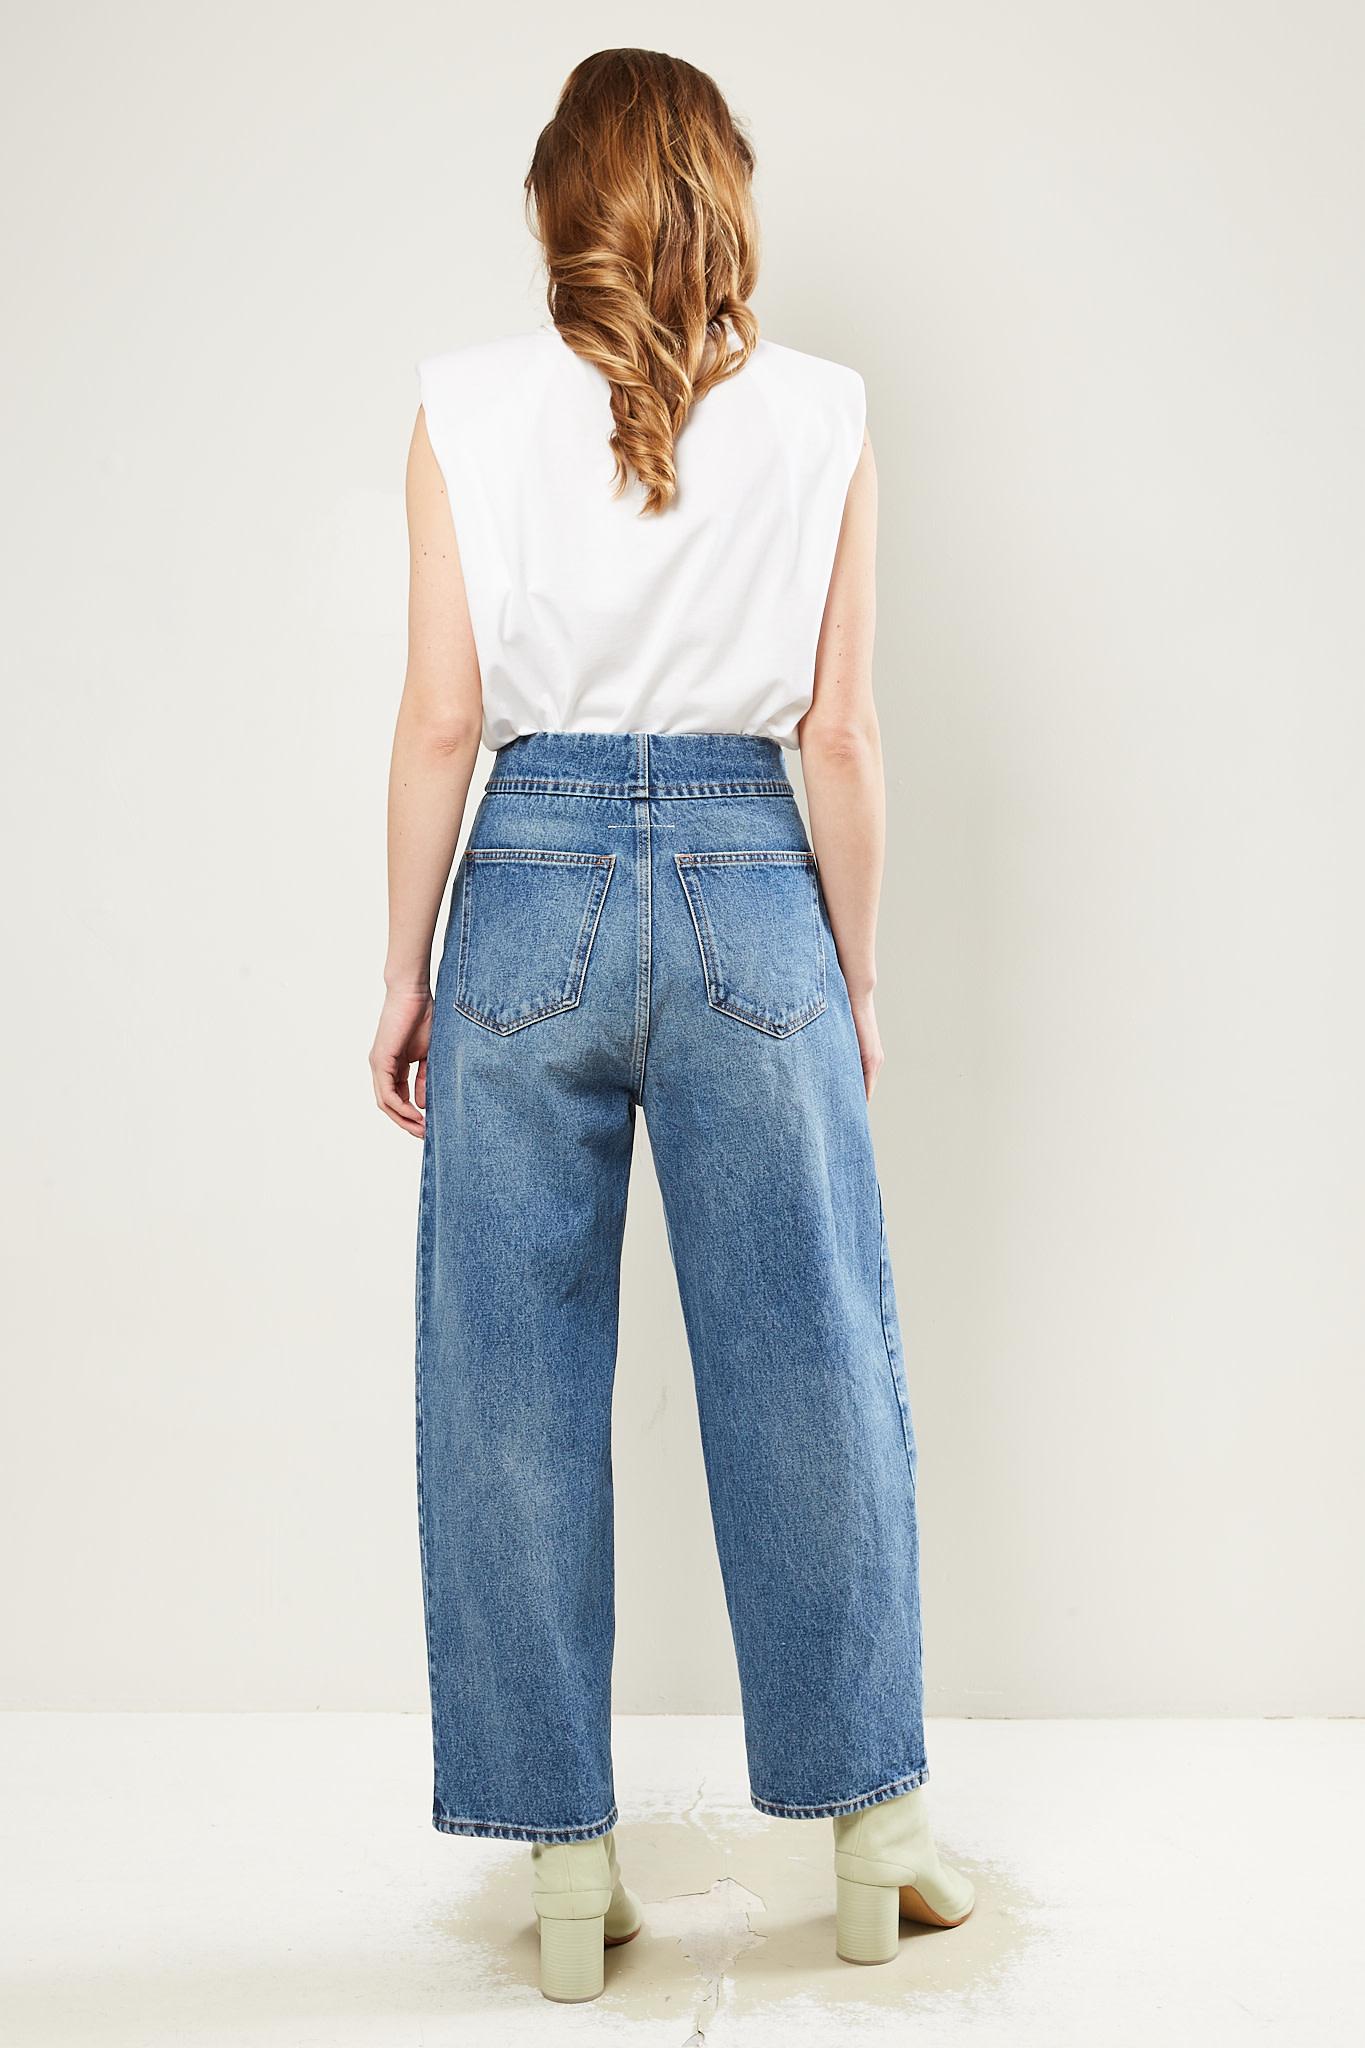 MM6 - Pants button 5 pockets MM6